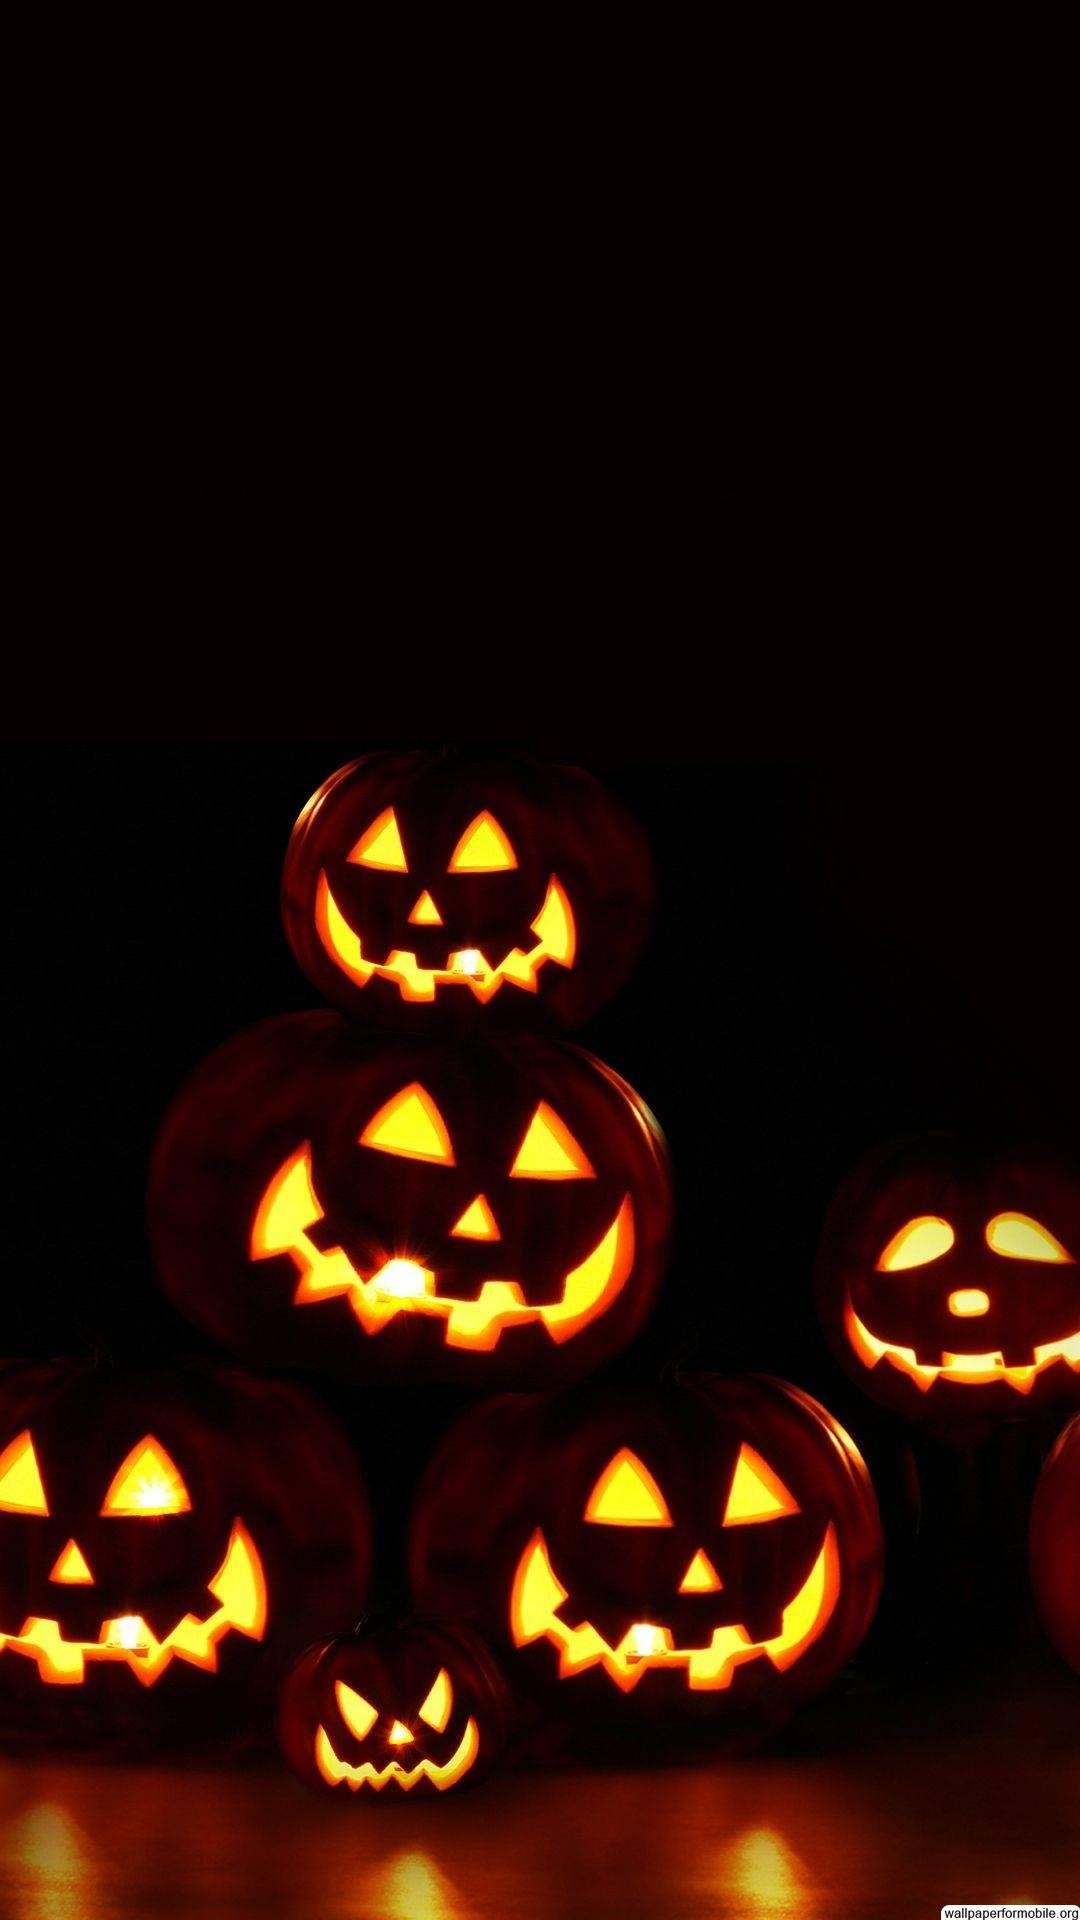 Amazing Wallpaper Halloween Light - 69041a0e43285050c31ef7a5d409e36d  Perfect Image Reference_96792.jpg